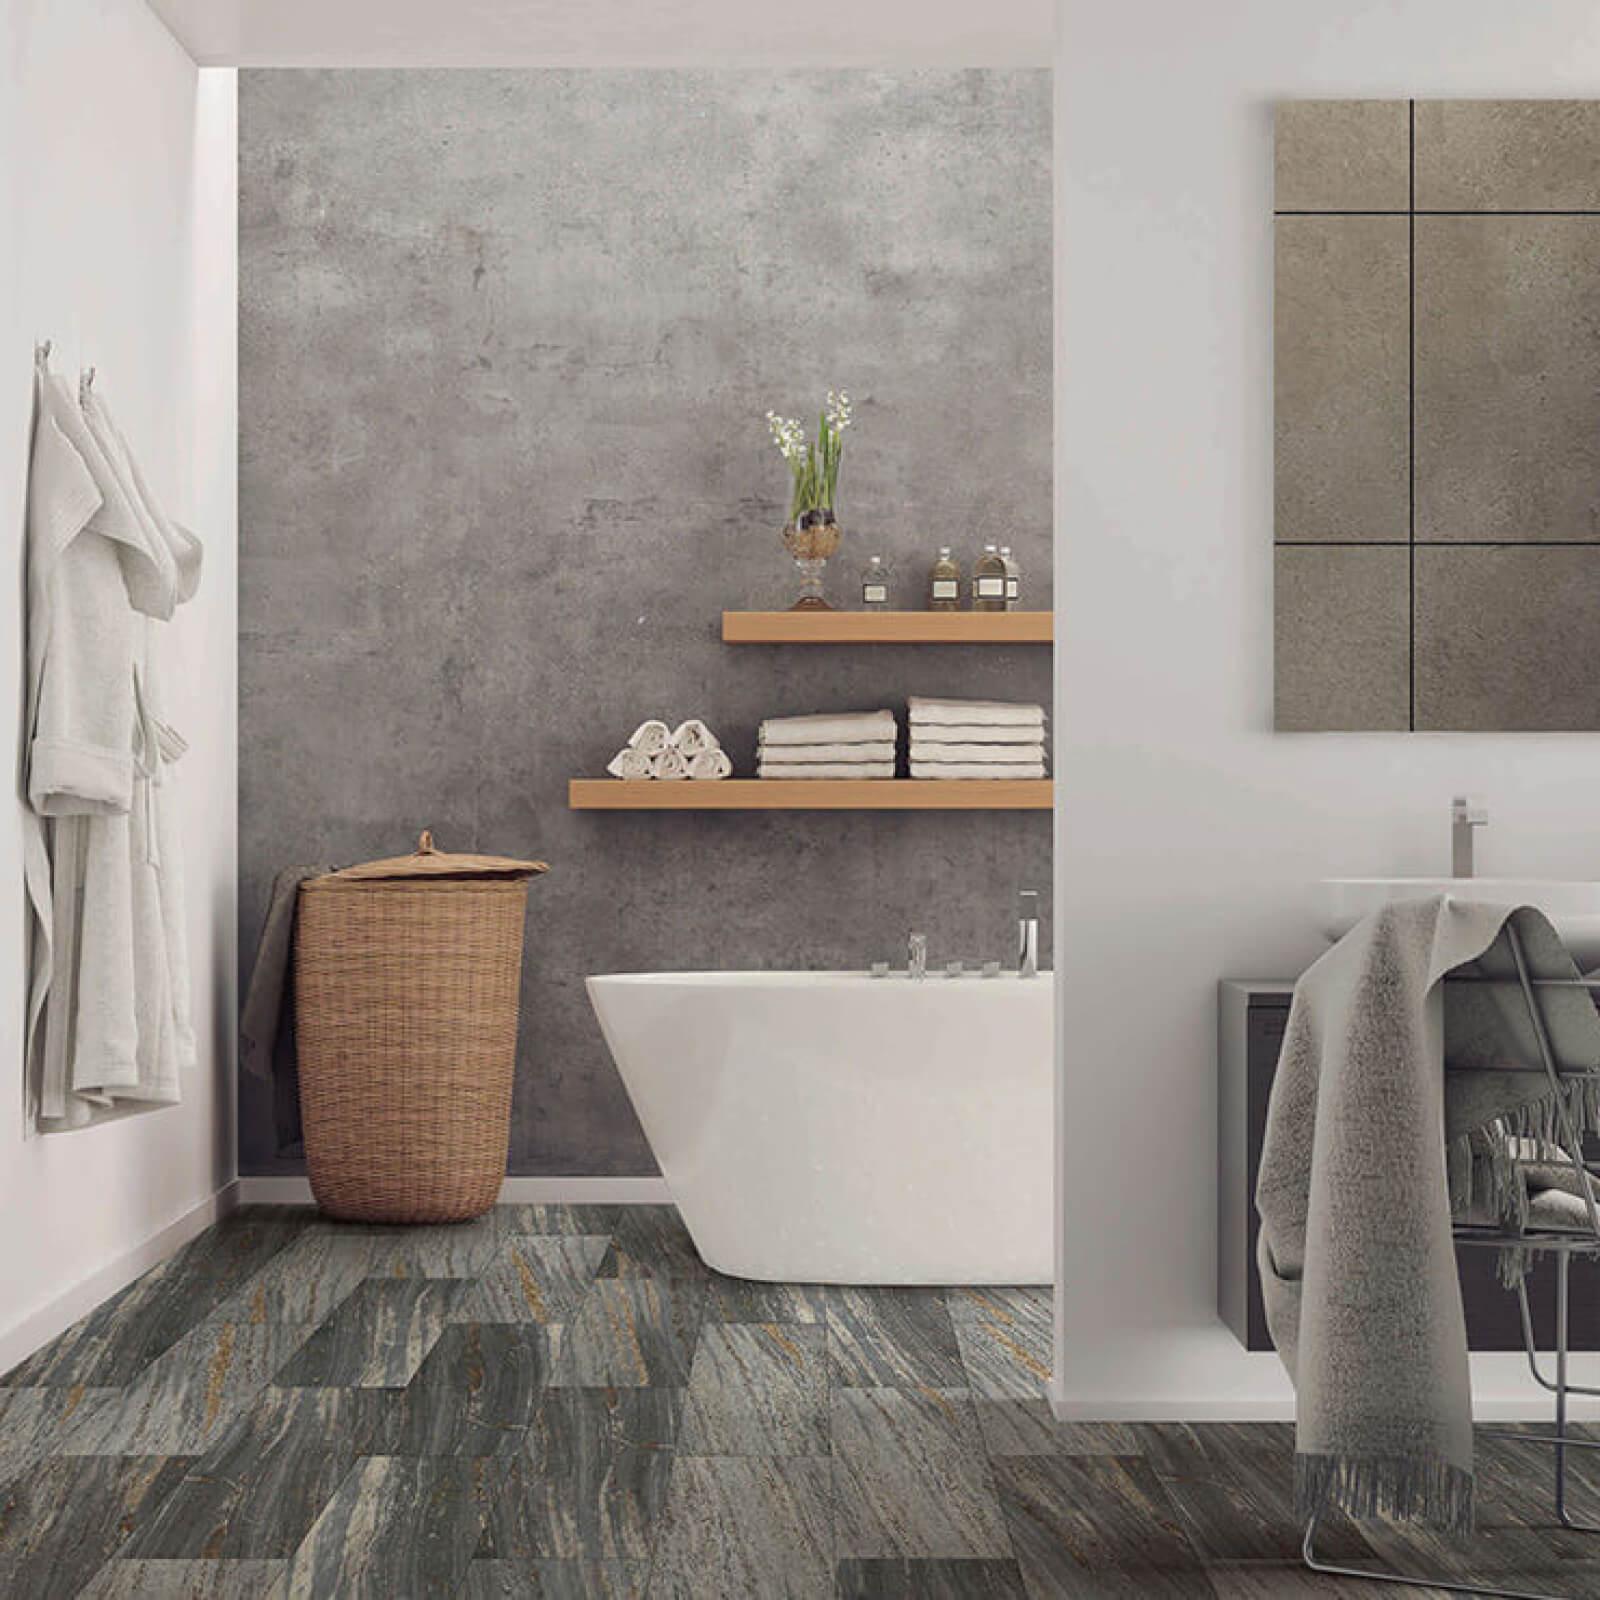 Bathroom flooring | Mill Direct Floor Coverings